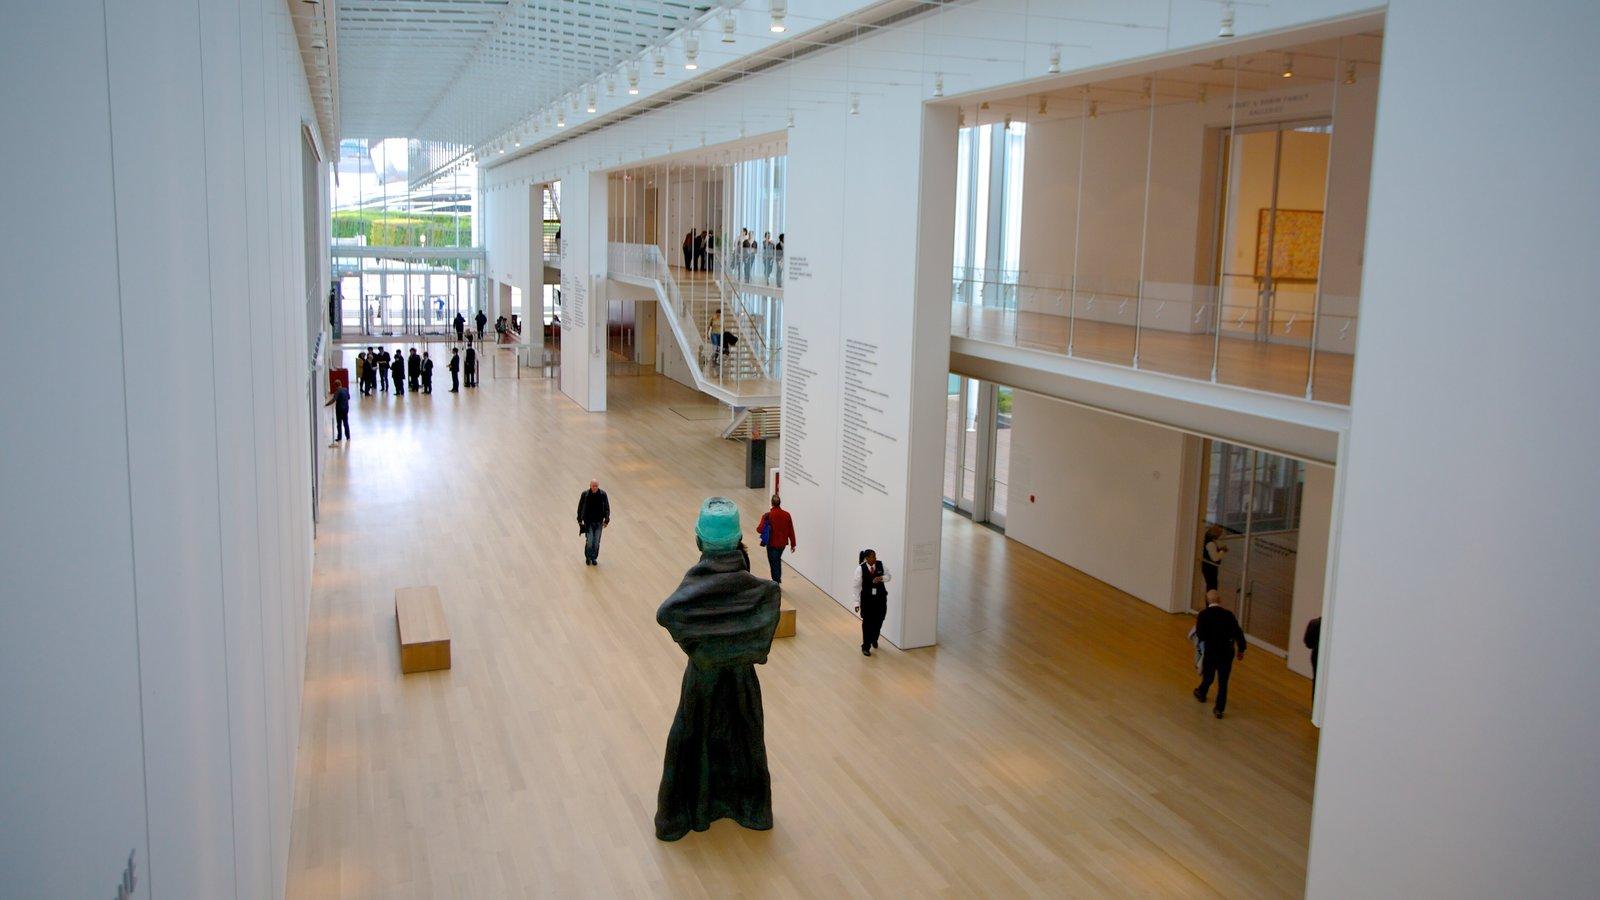 Art Institute of Chicago featuring interior views and art